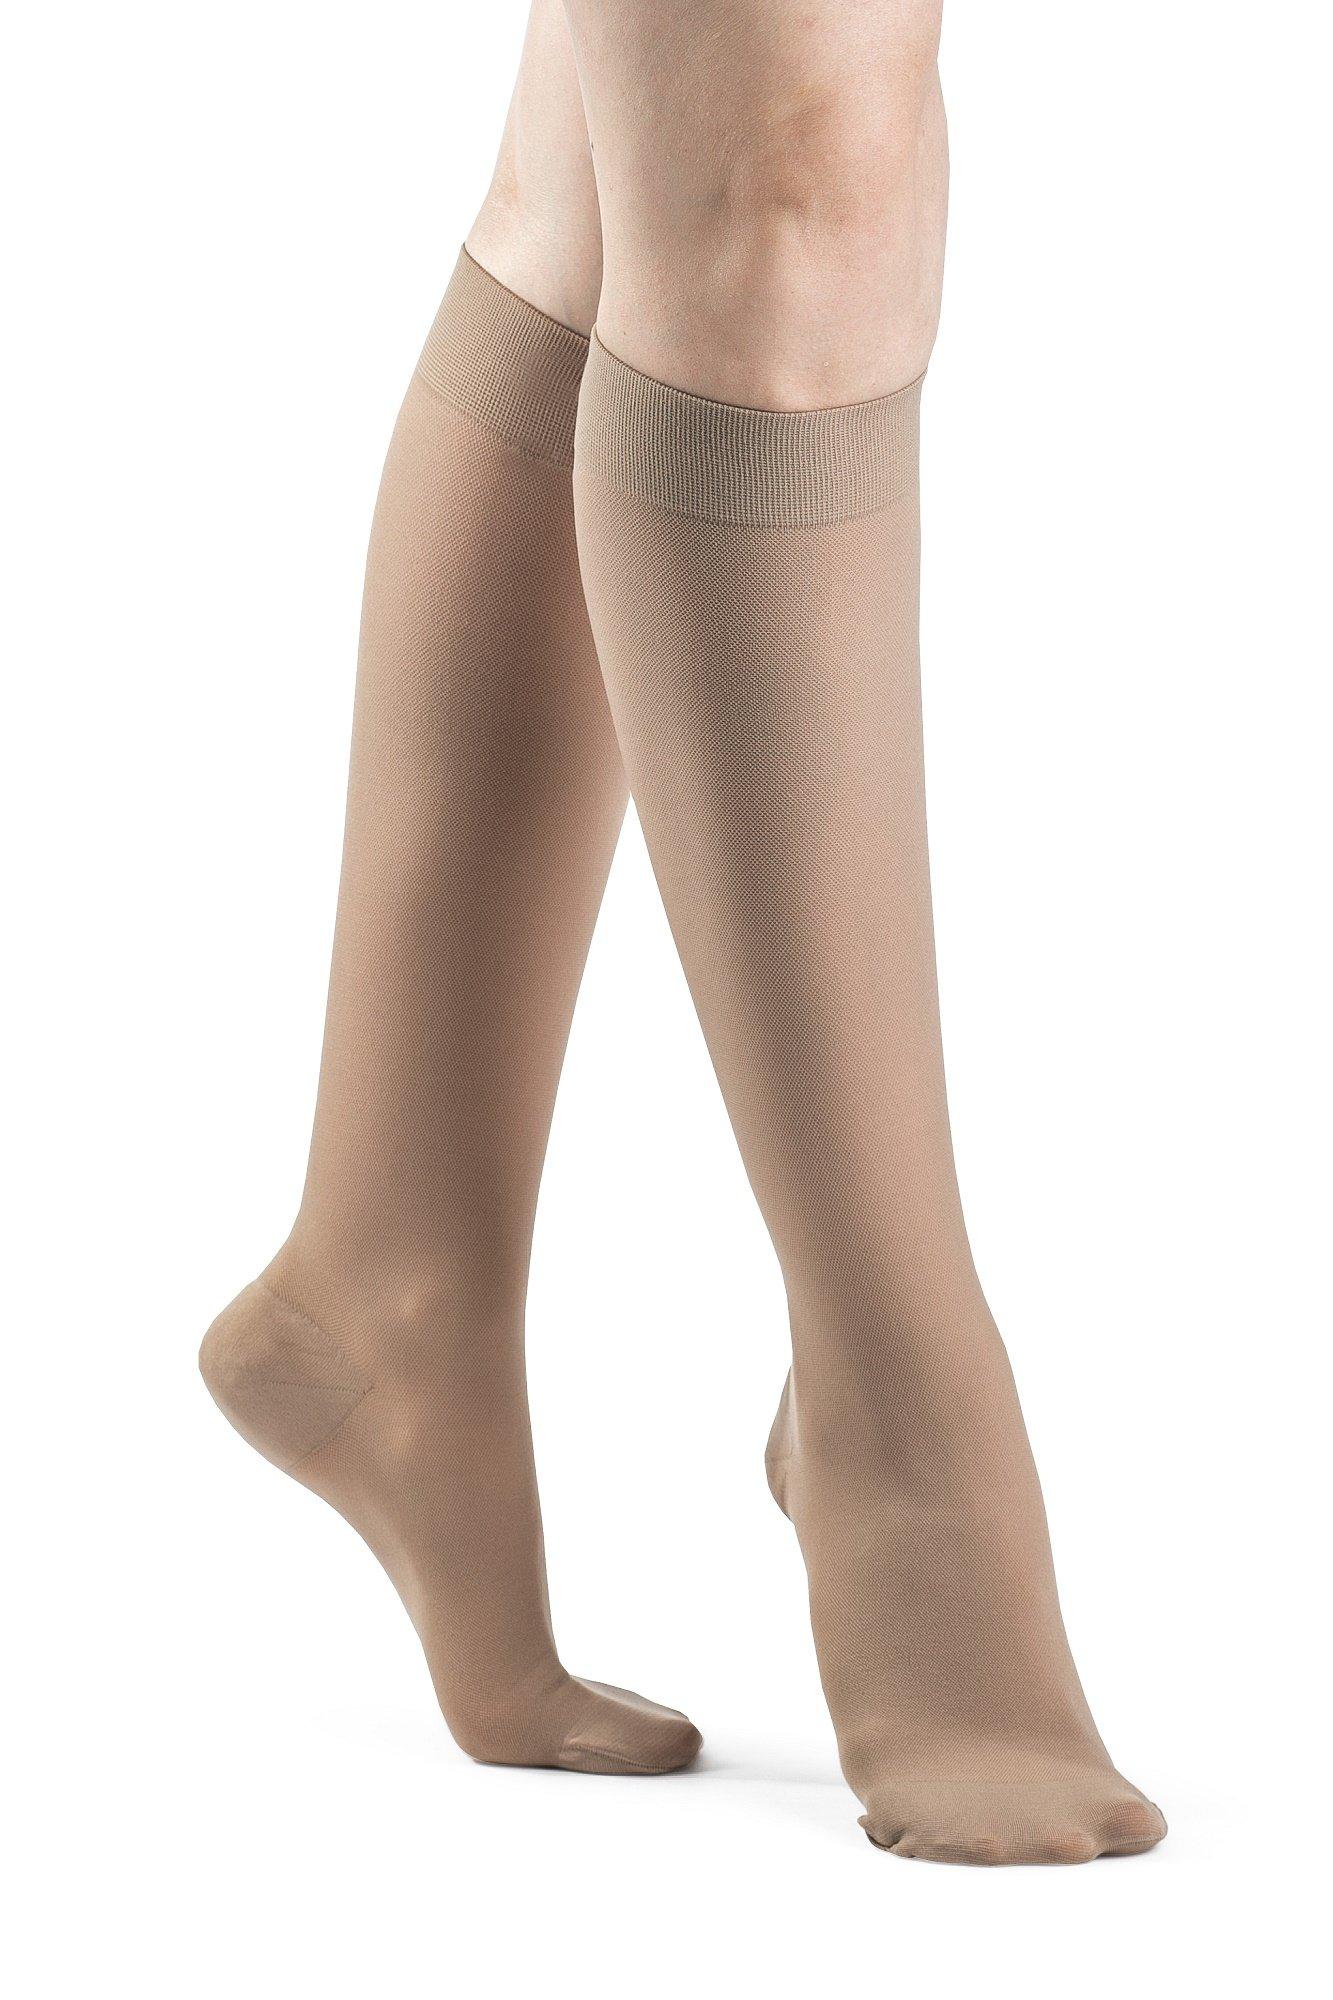 970 Access Series 20-30 mmHg Women's Closed Toe Knee High Sock Size: Medium Short (MS)